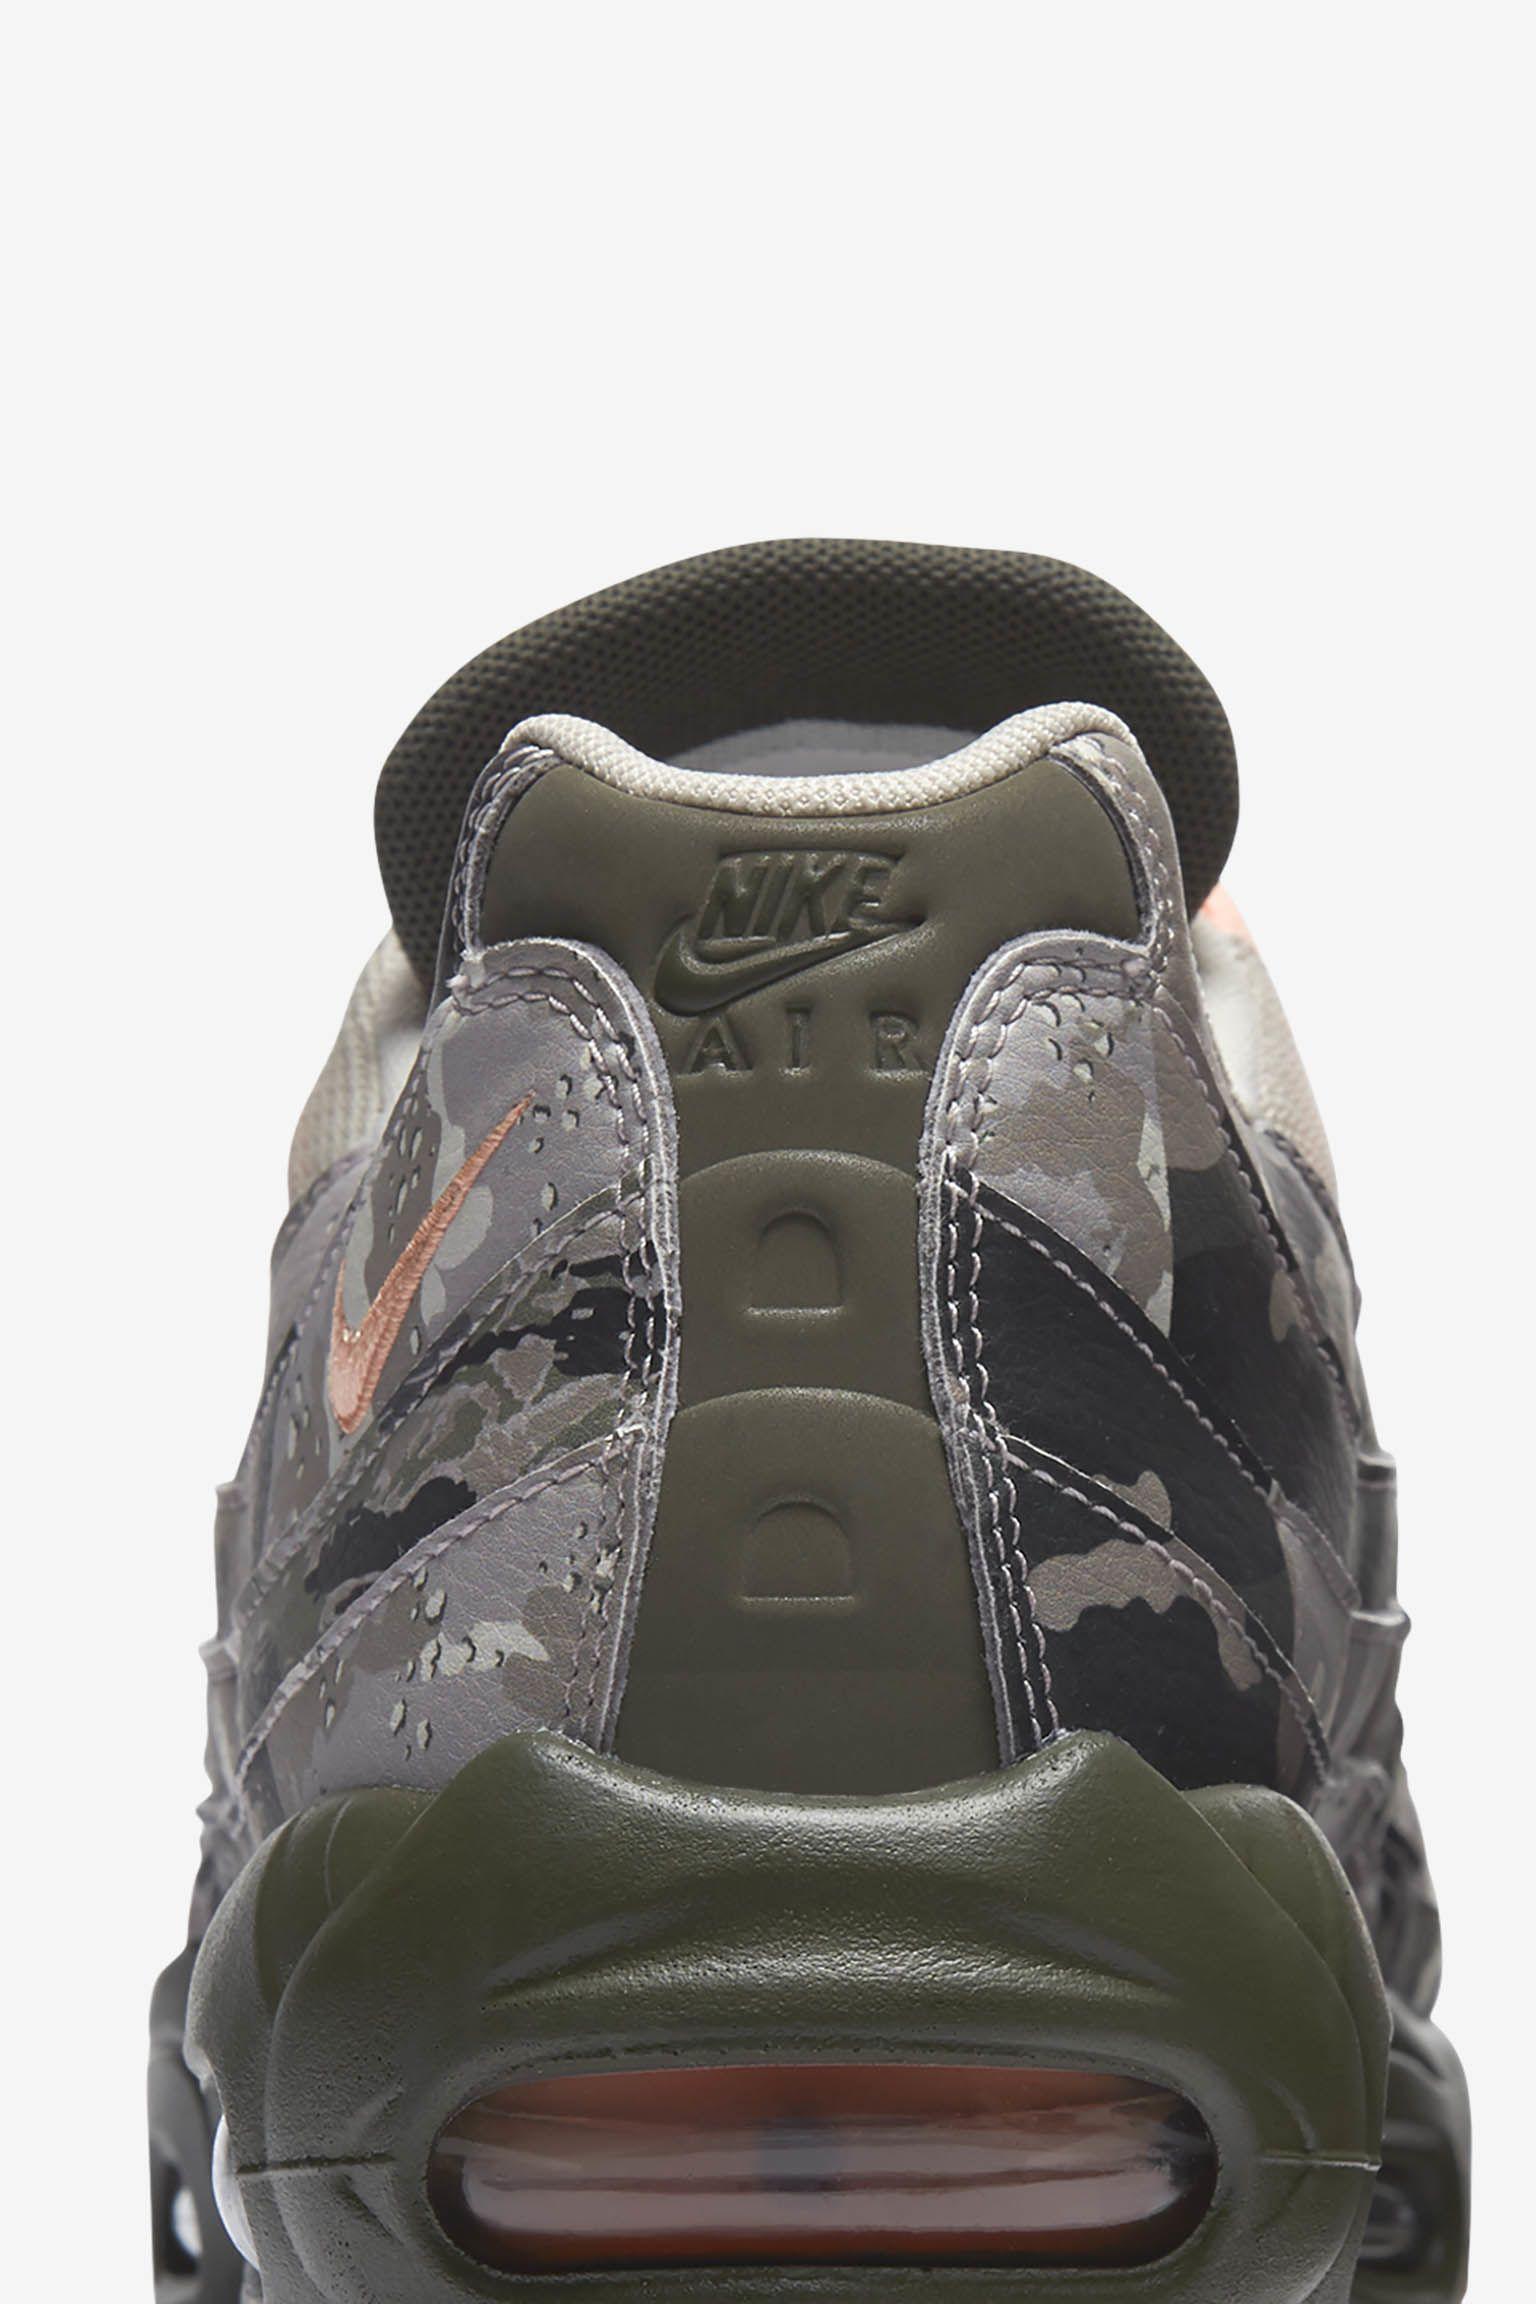 Nike Air Max 95 'Cargo Khaki & Sunset Tint' Release Date